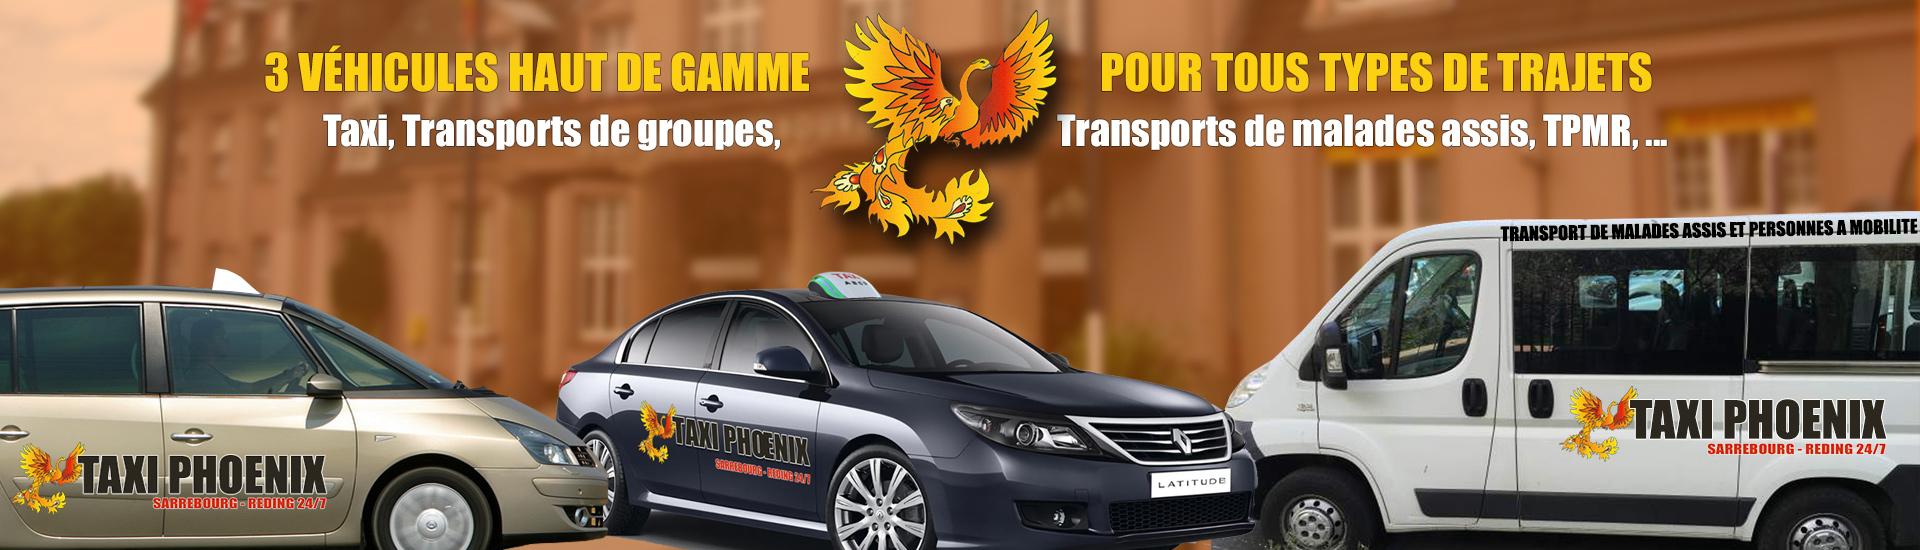 Taxi Phoenix Sarrebourg